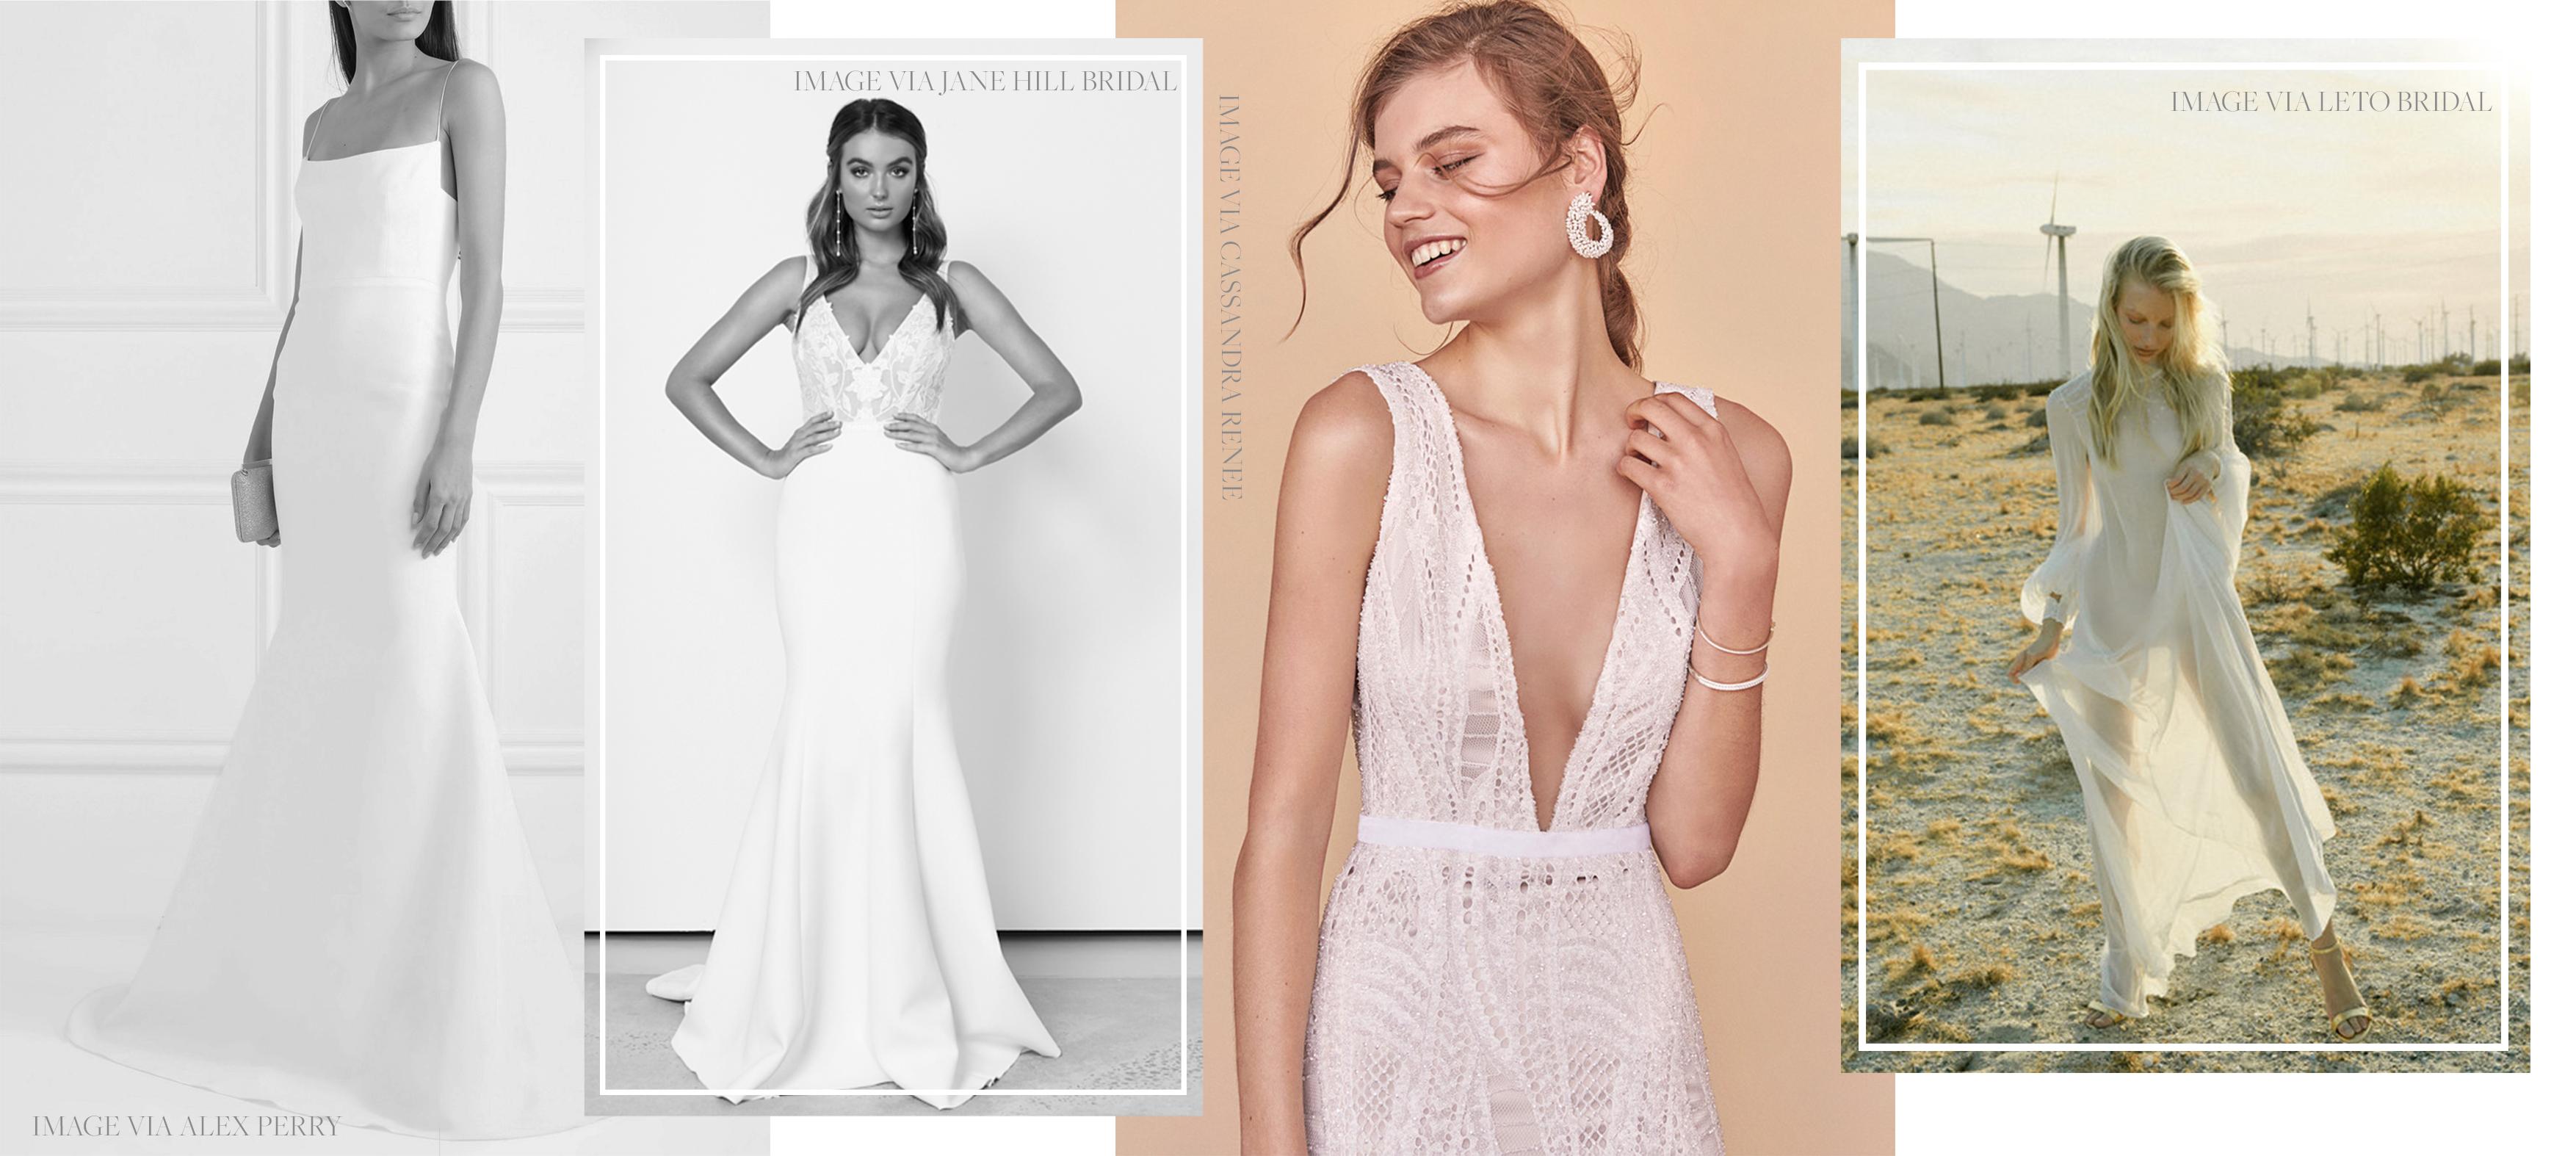 wedding-dress-petite-frame-body-type